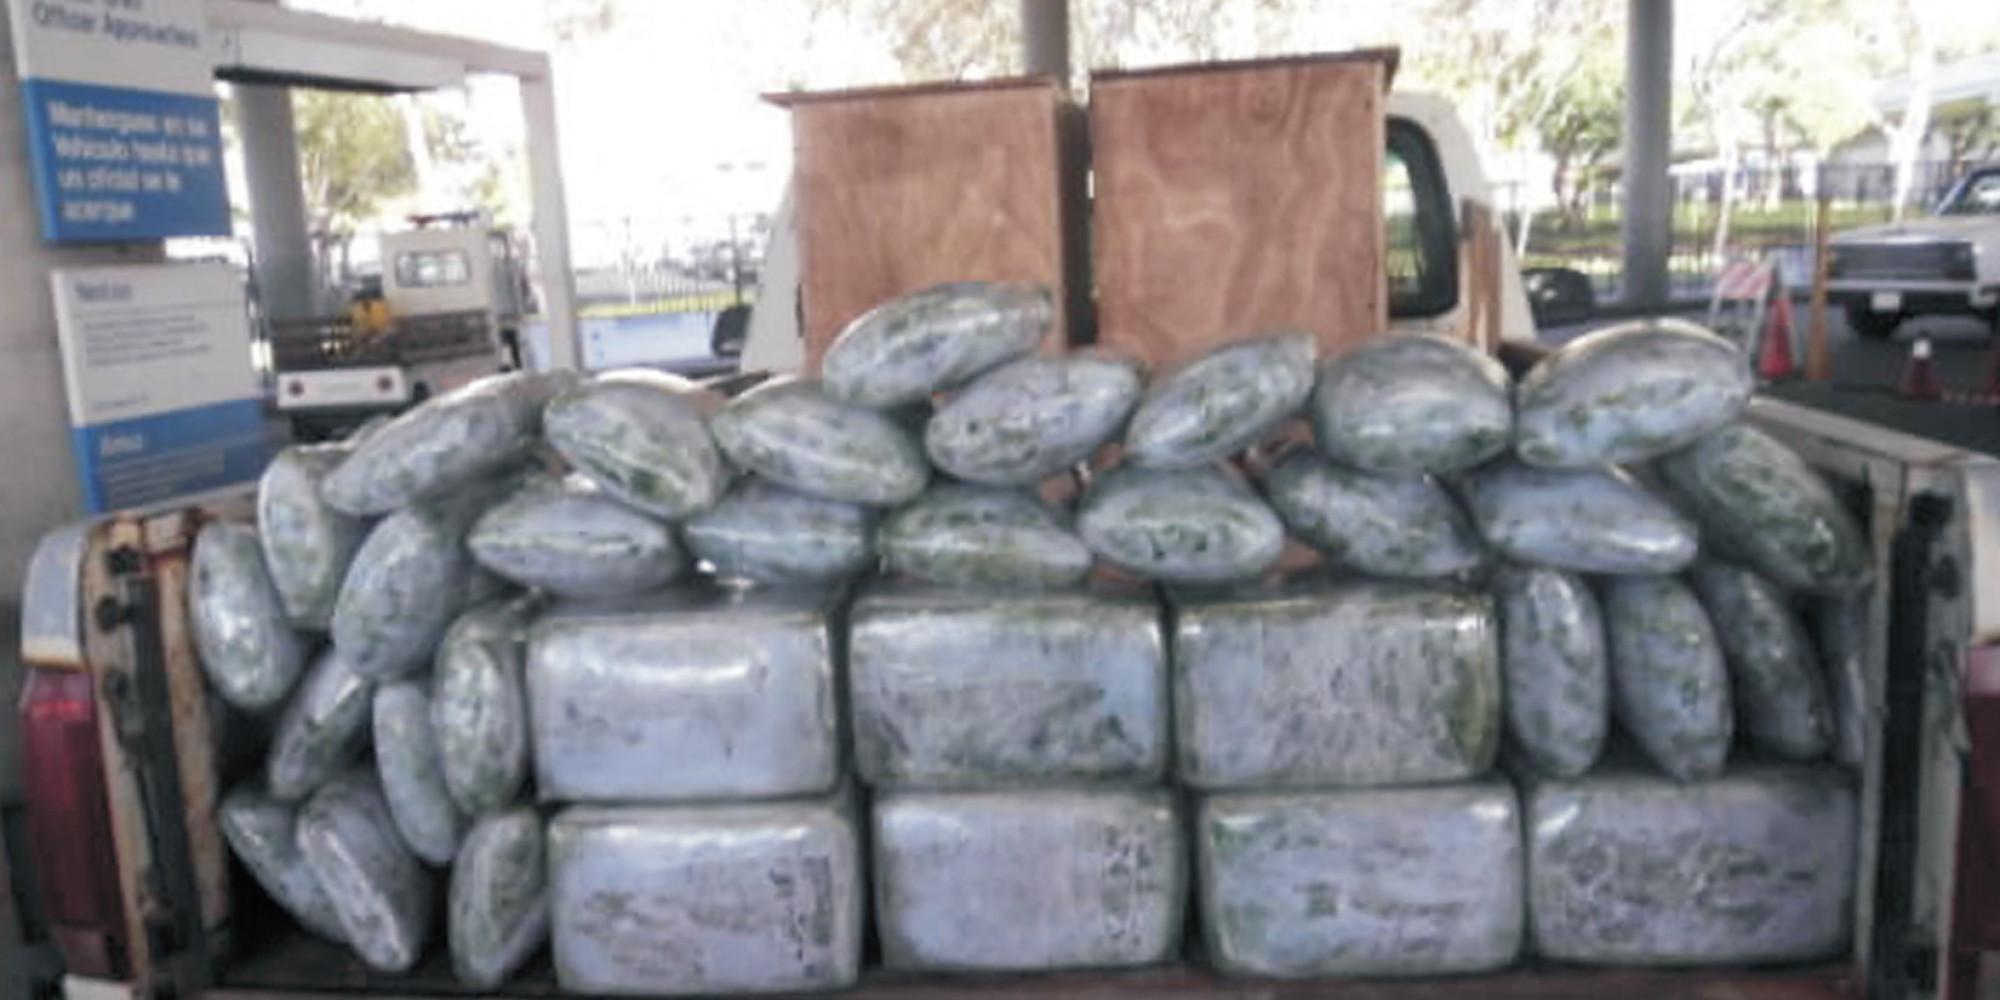 15 Tons Of Marijuana Seized At  1 Ton Of Weed